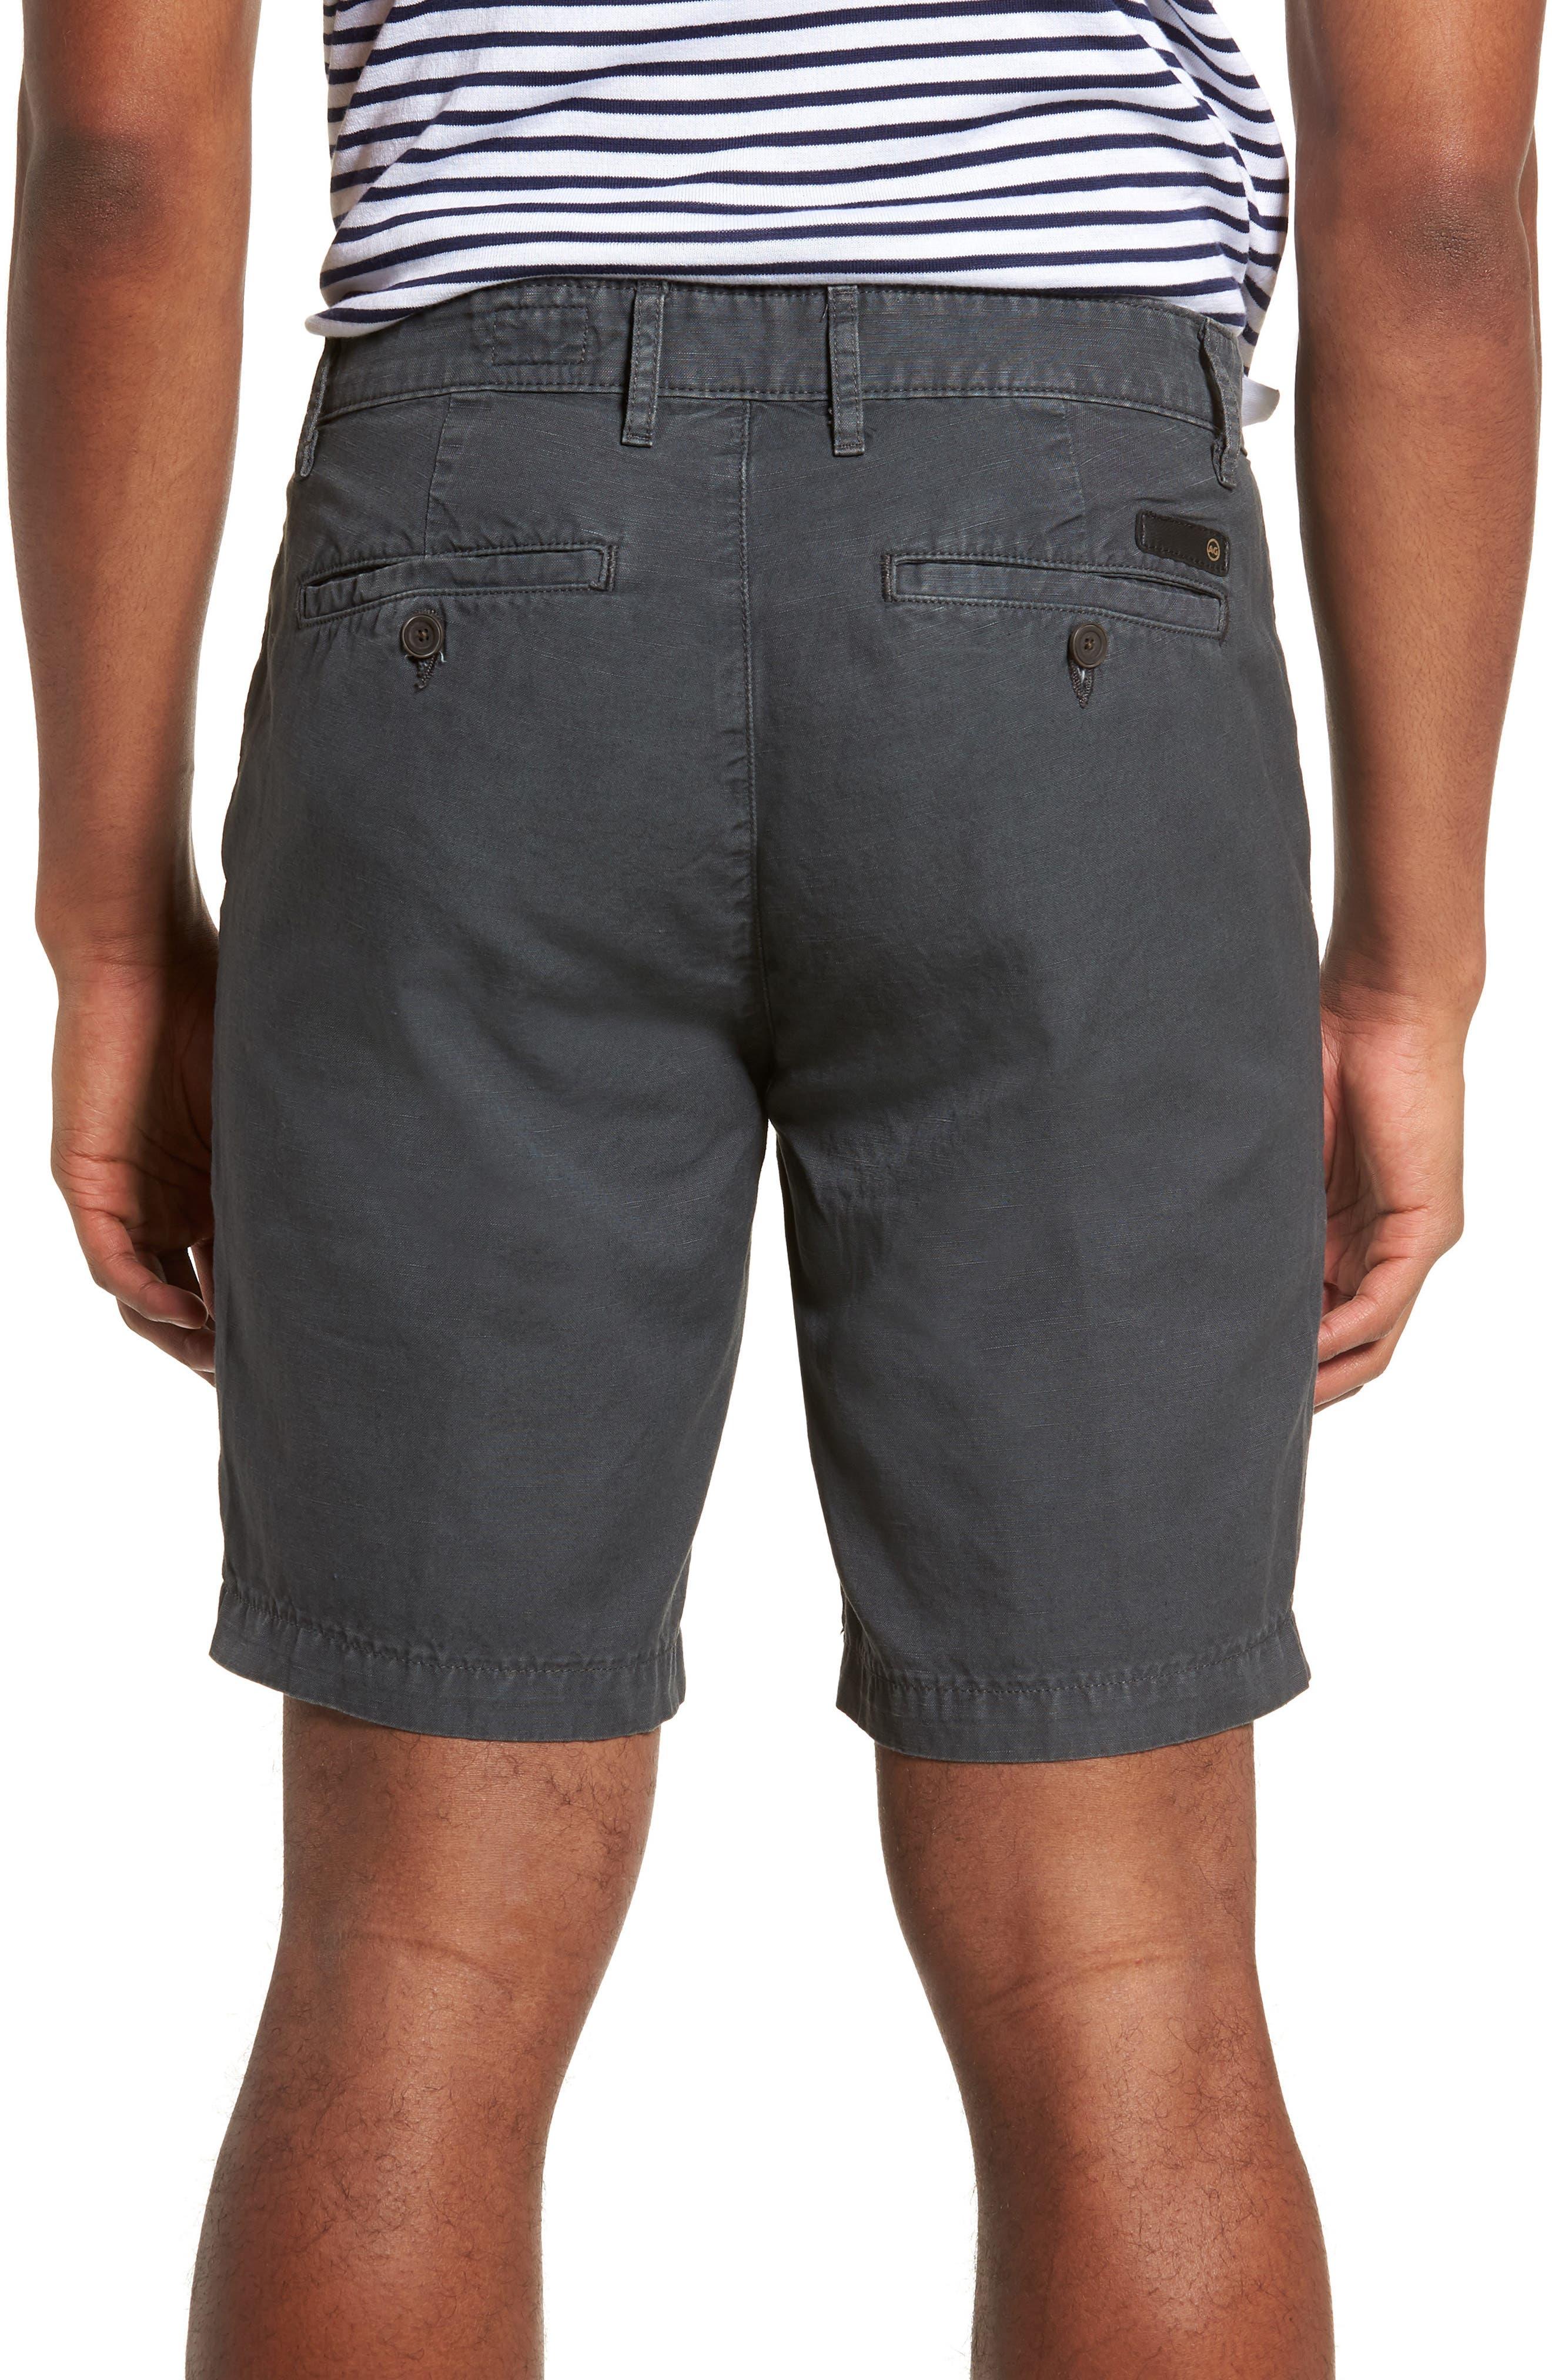 Wanderer Slim Fit Cotton & Linen Shorts,                             Alternate thumbnail 2, color,                             SULFUR SMOKE GREY